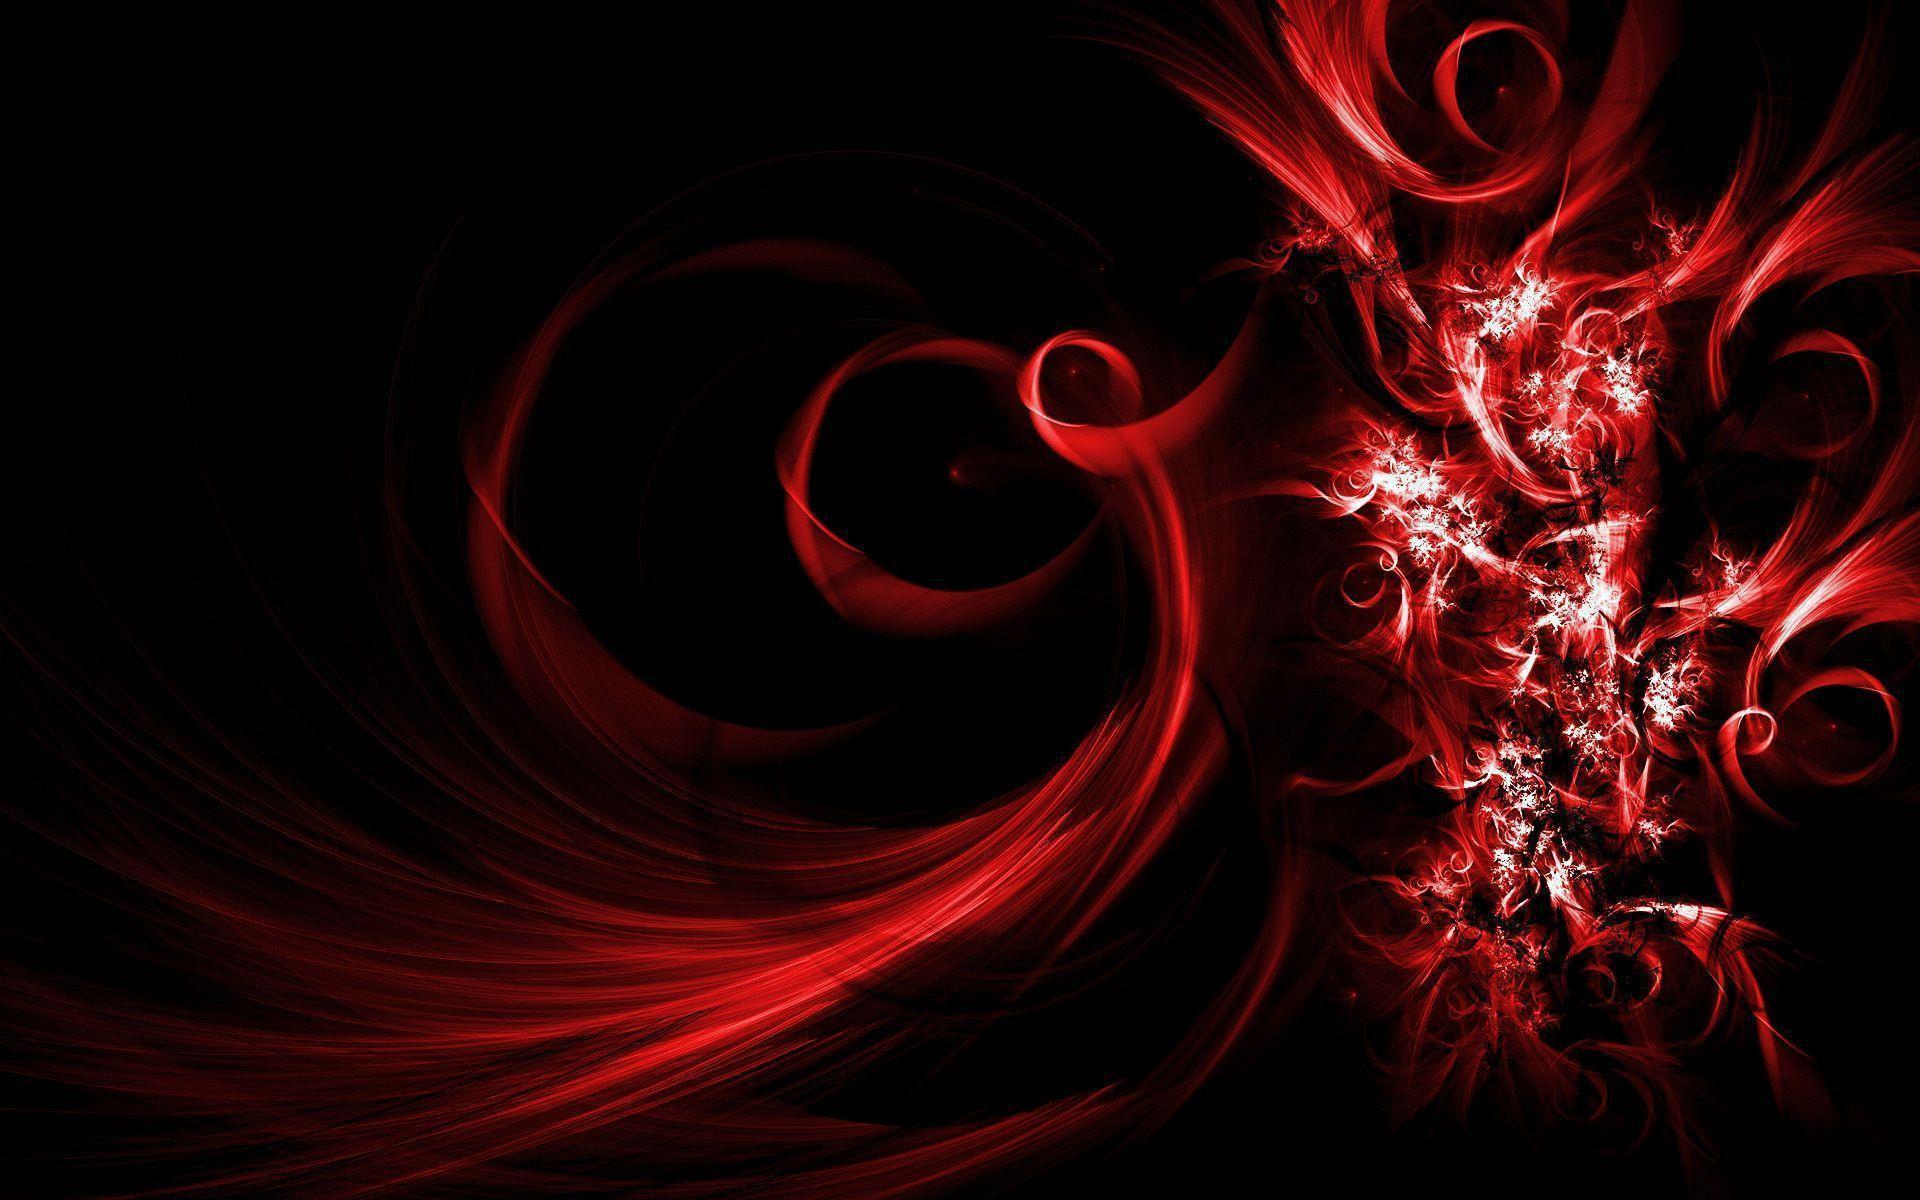 Red Wallpaper 4k